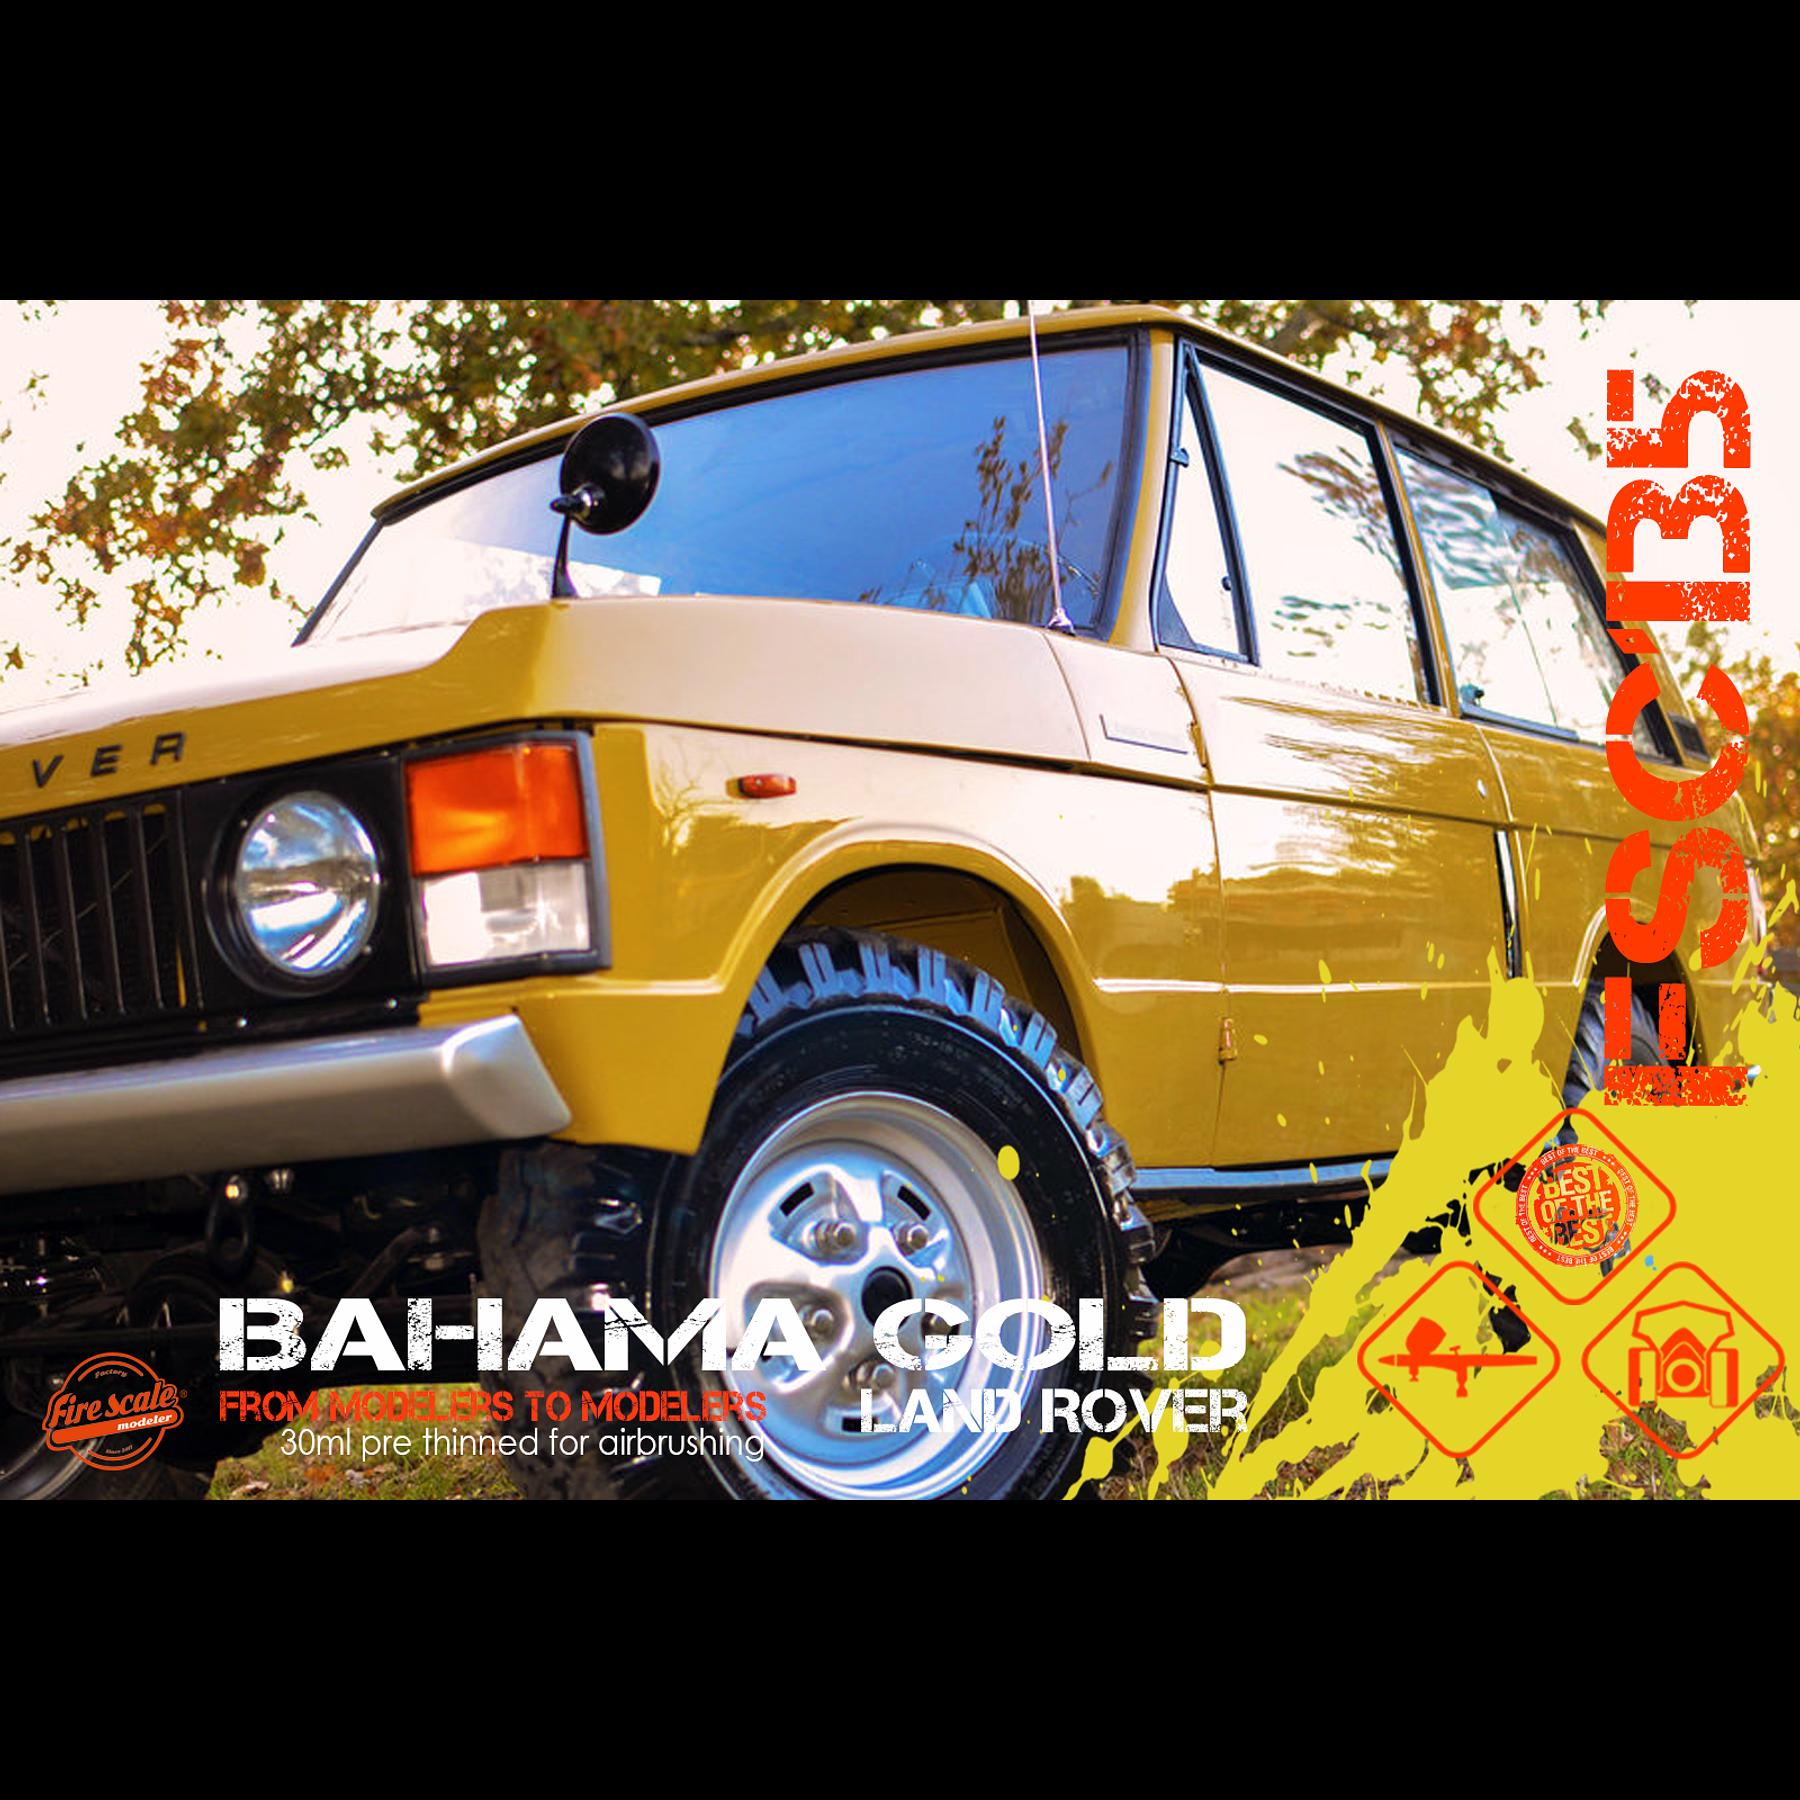 Land Rover Bahama Or